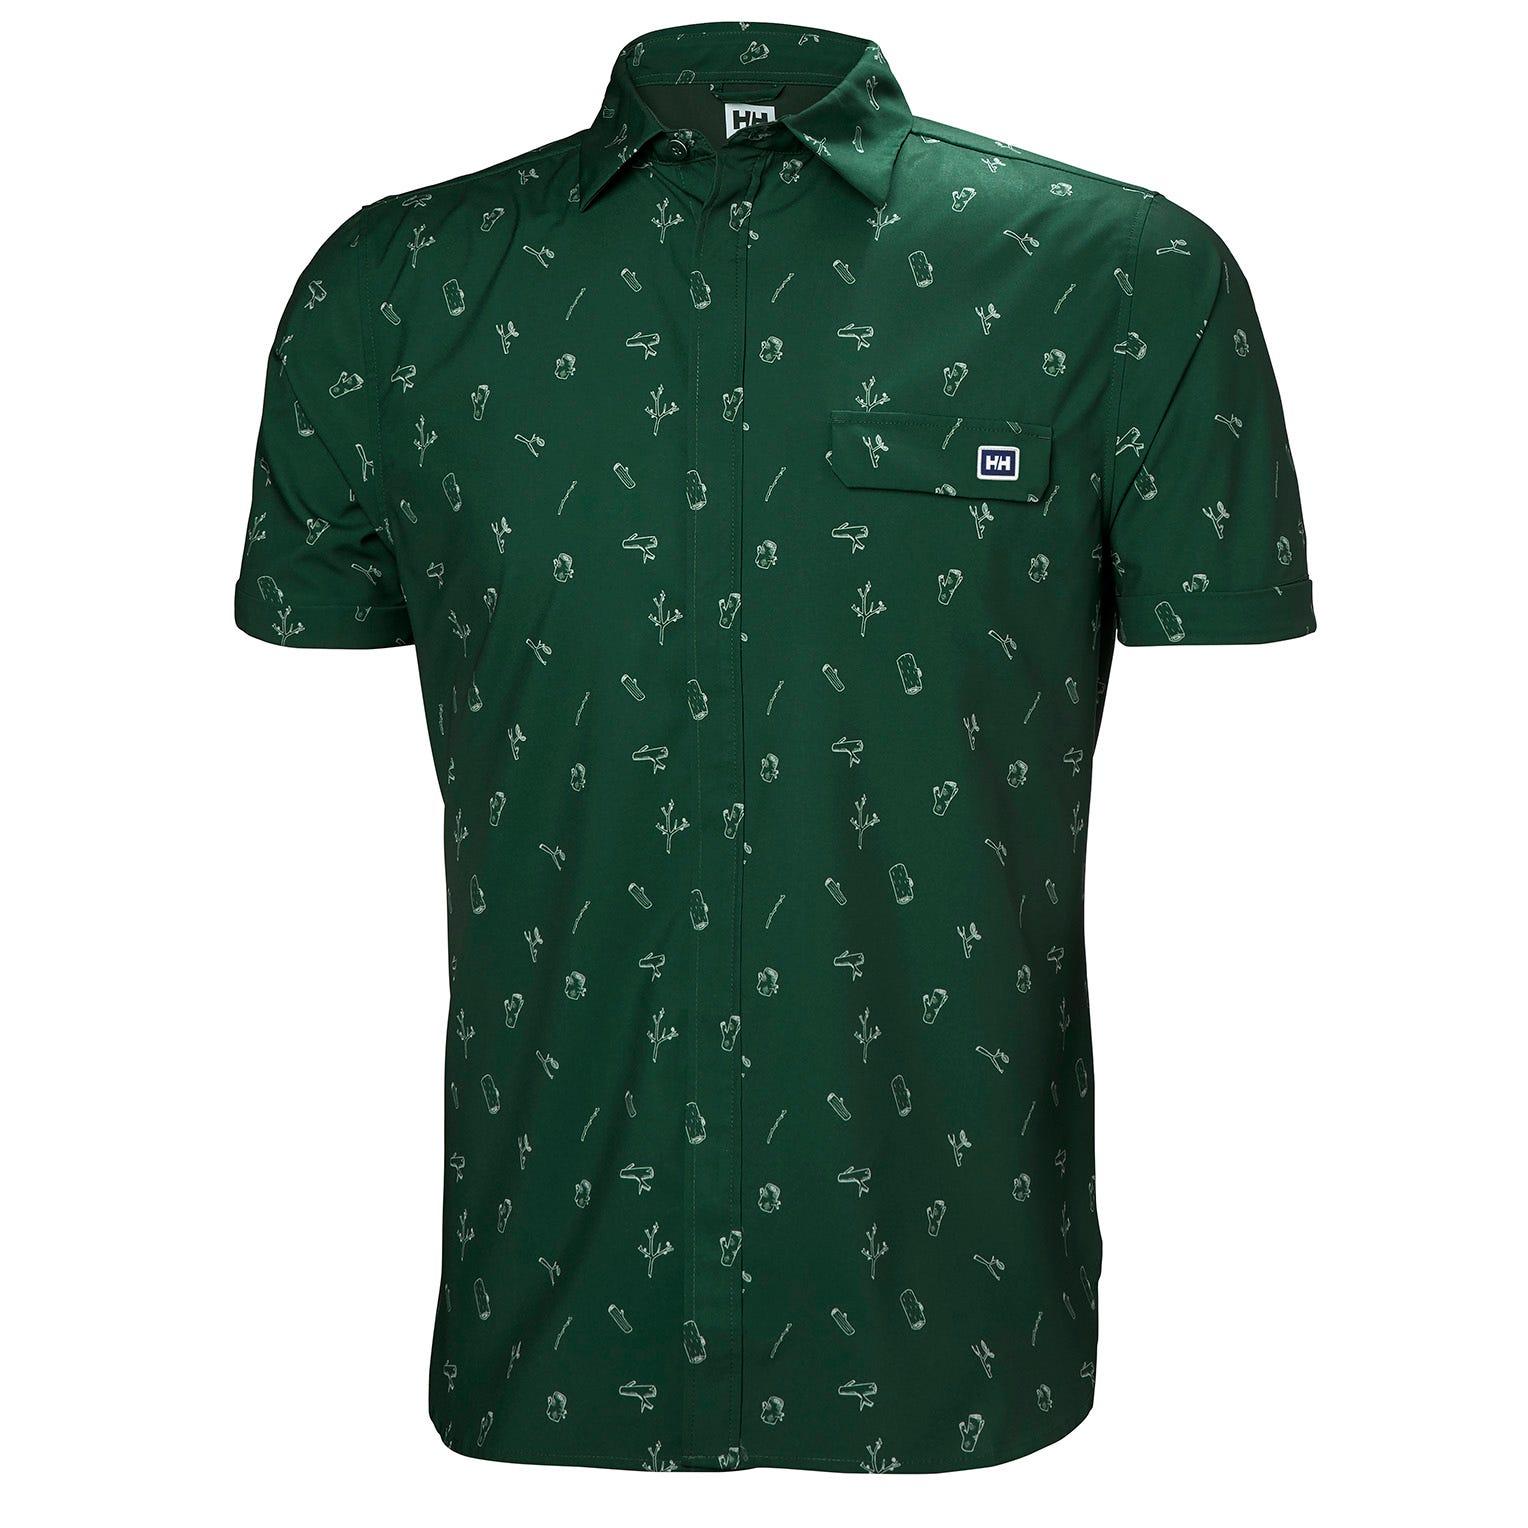 Helly Hansen Oya Shirt Green L